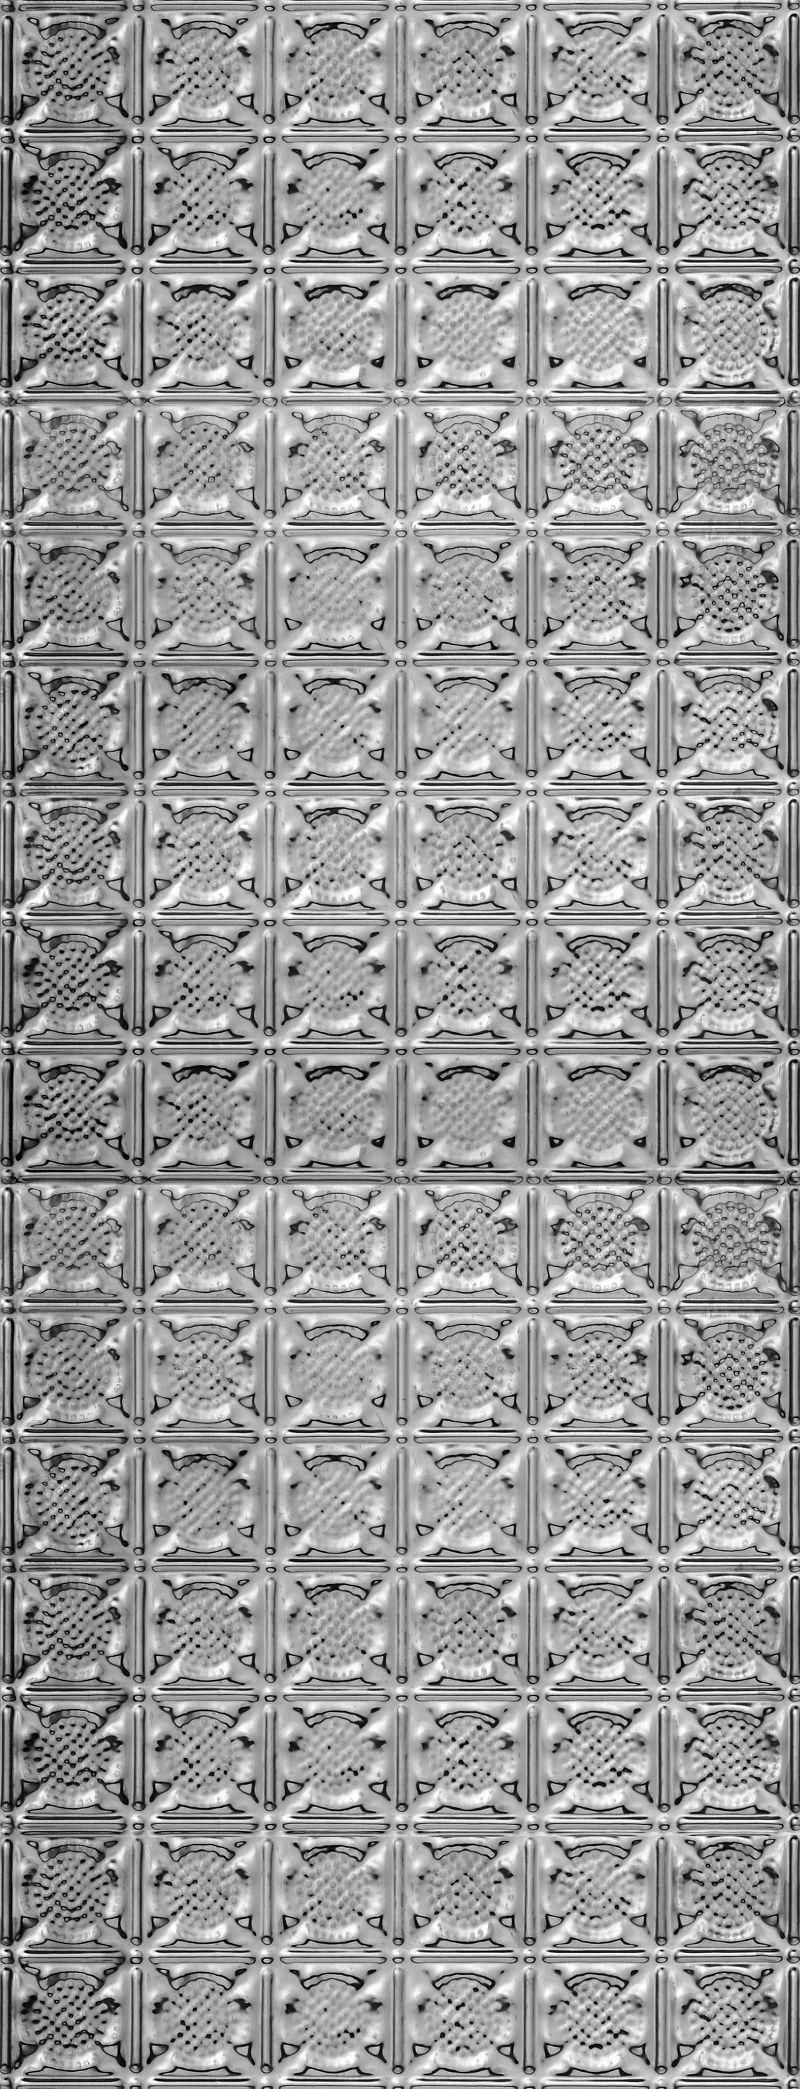 metallaire backsplashes 5400234bna armstrong ceilings residential metallaire medallion backsplash 18 5